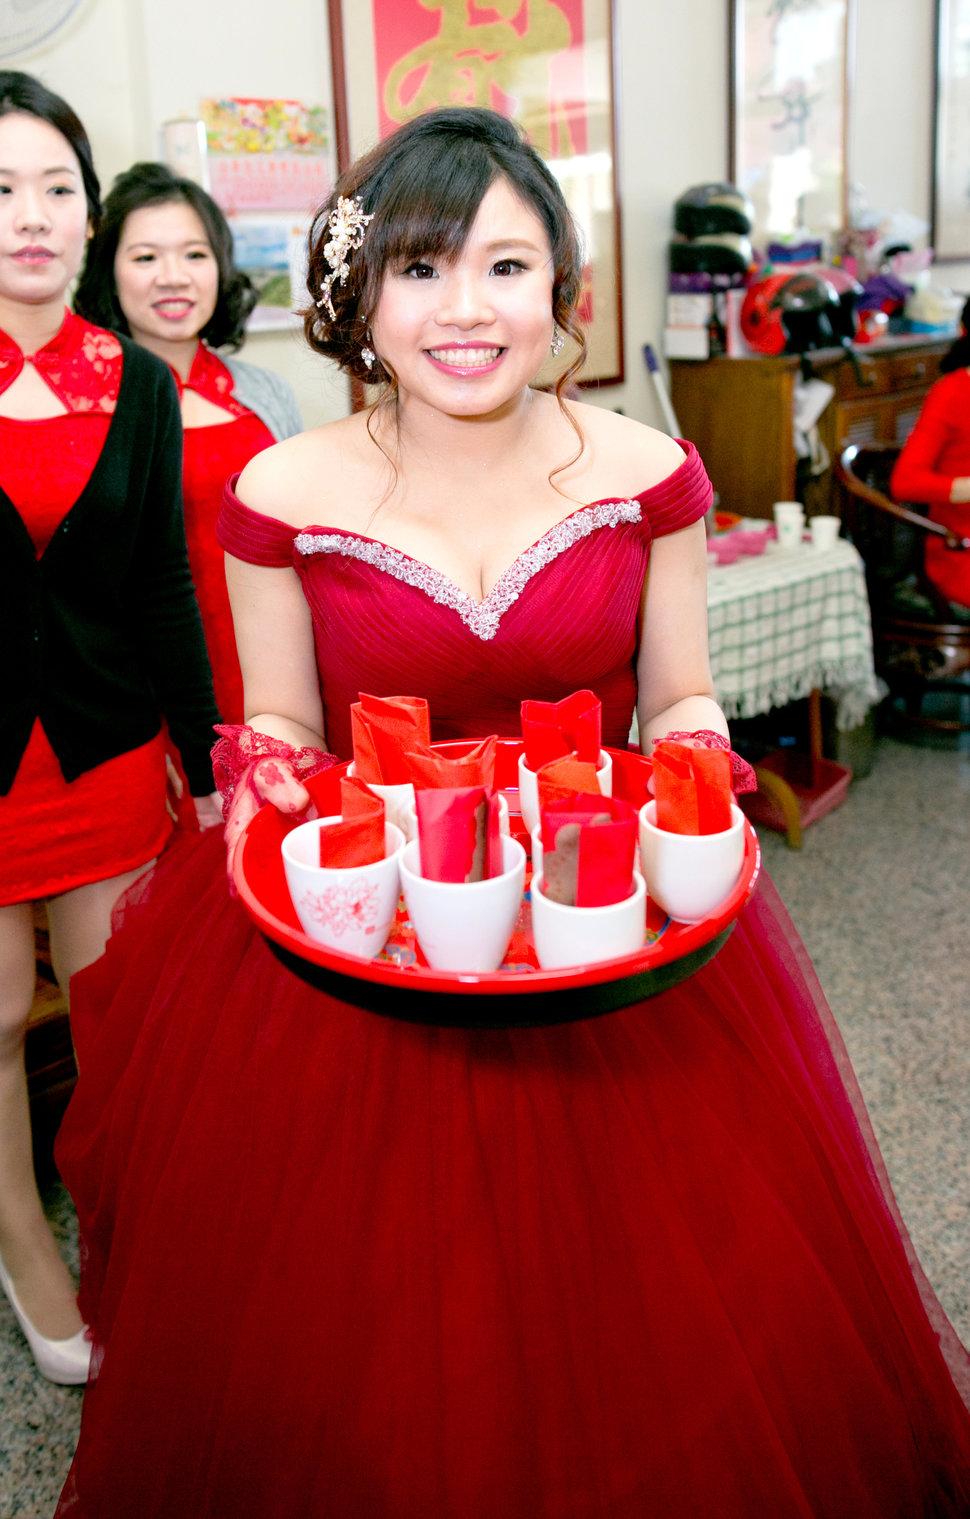 YF2A1001 - Yusin 攝影~與您同心祝福您永結同心 - 結婚吧